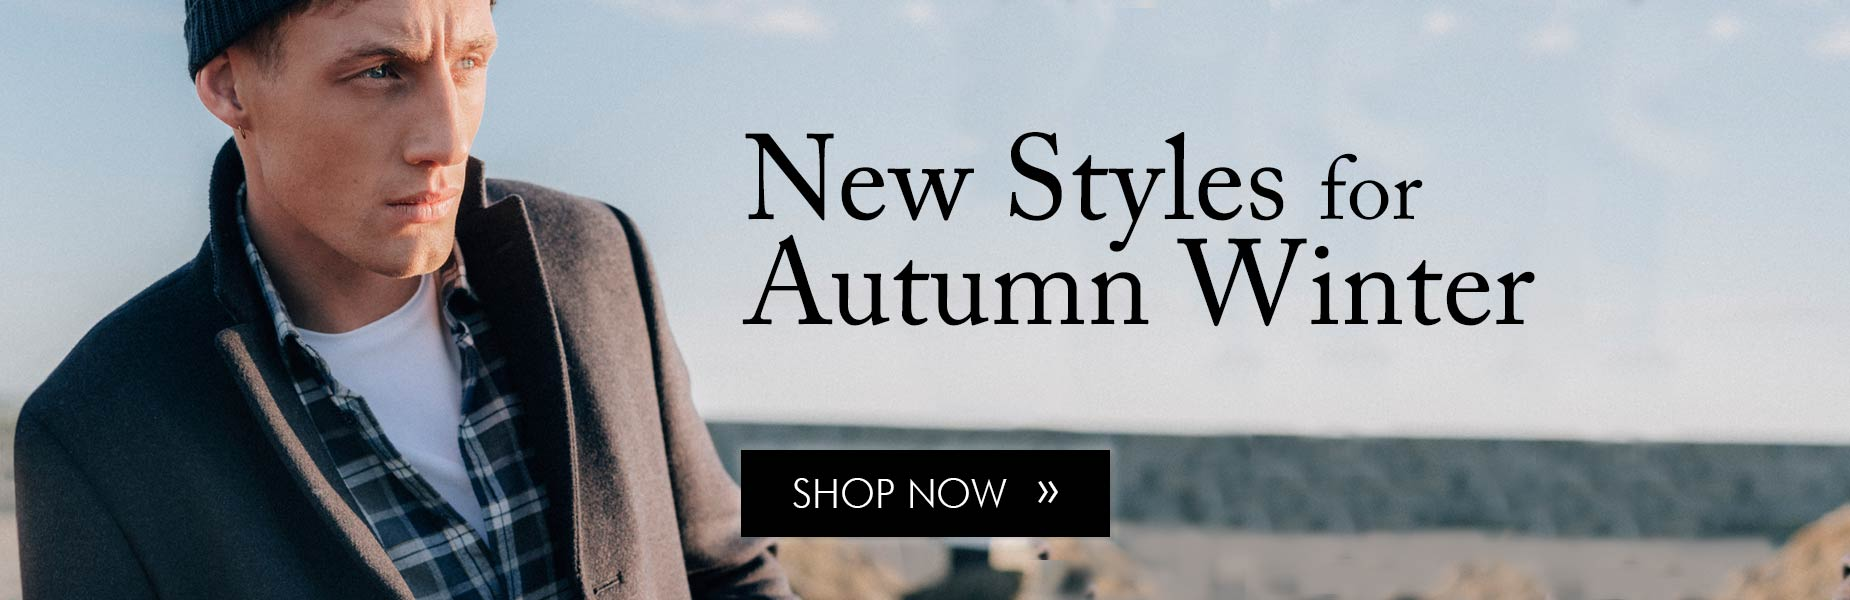 New Winters Styles